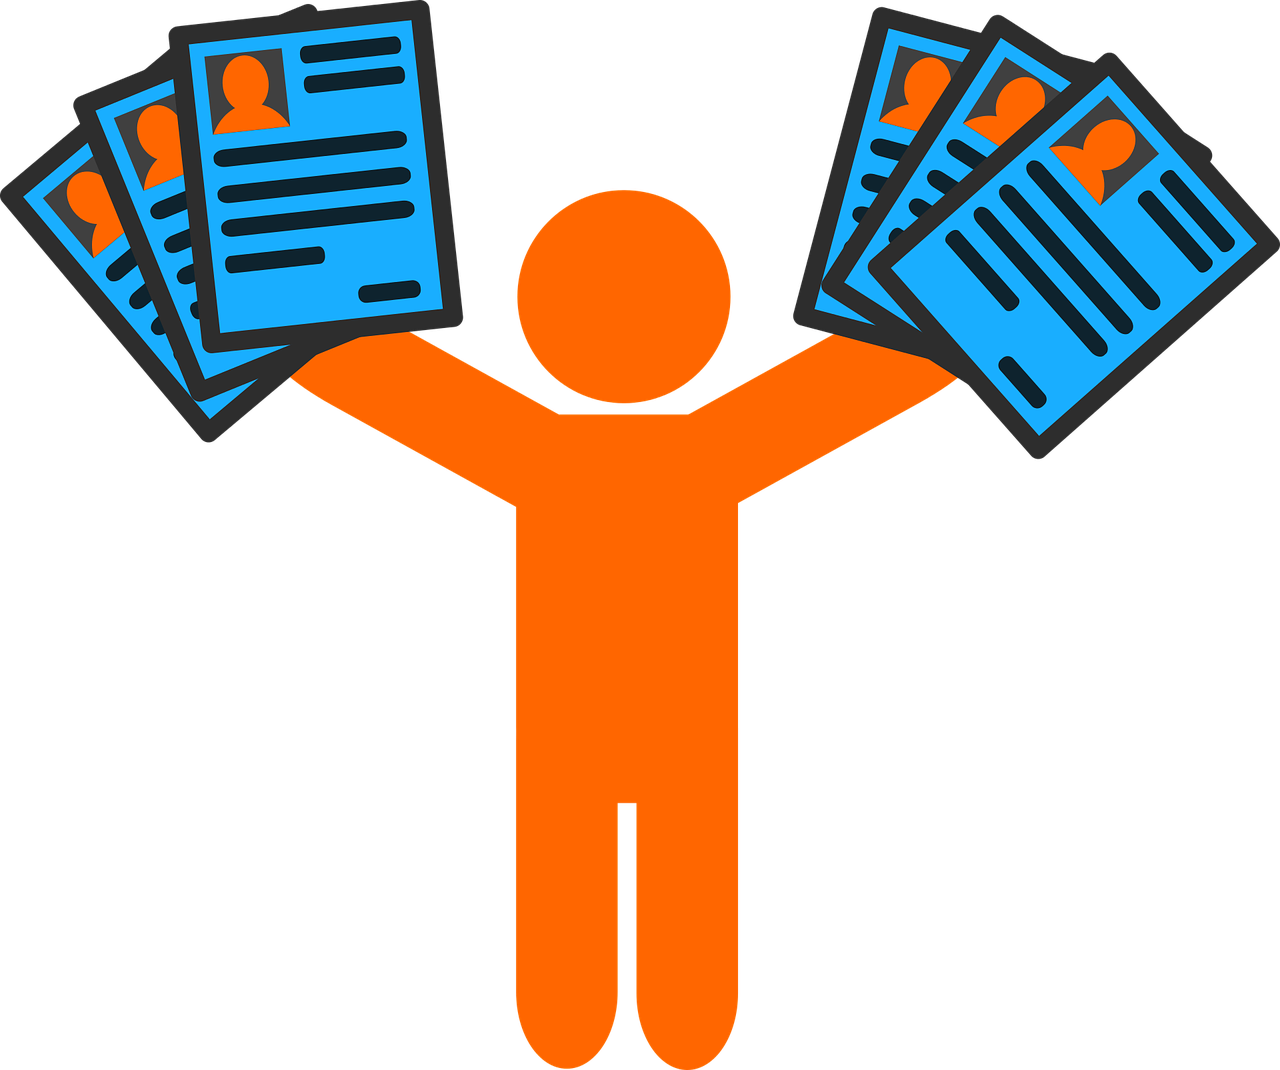 Job clipart job offer, Job job offer Transparent FREE for.